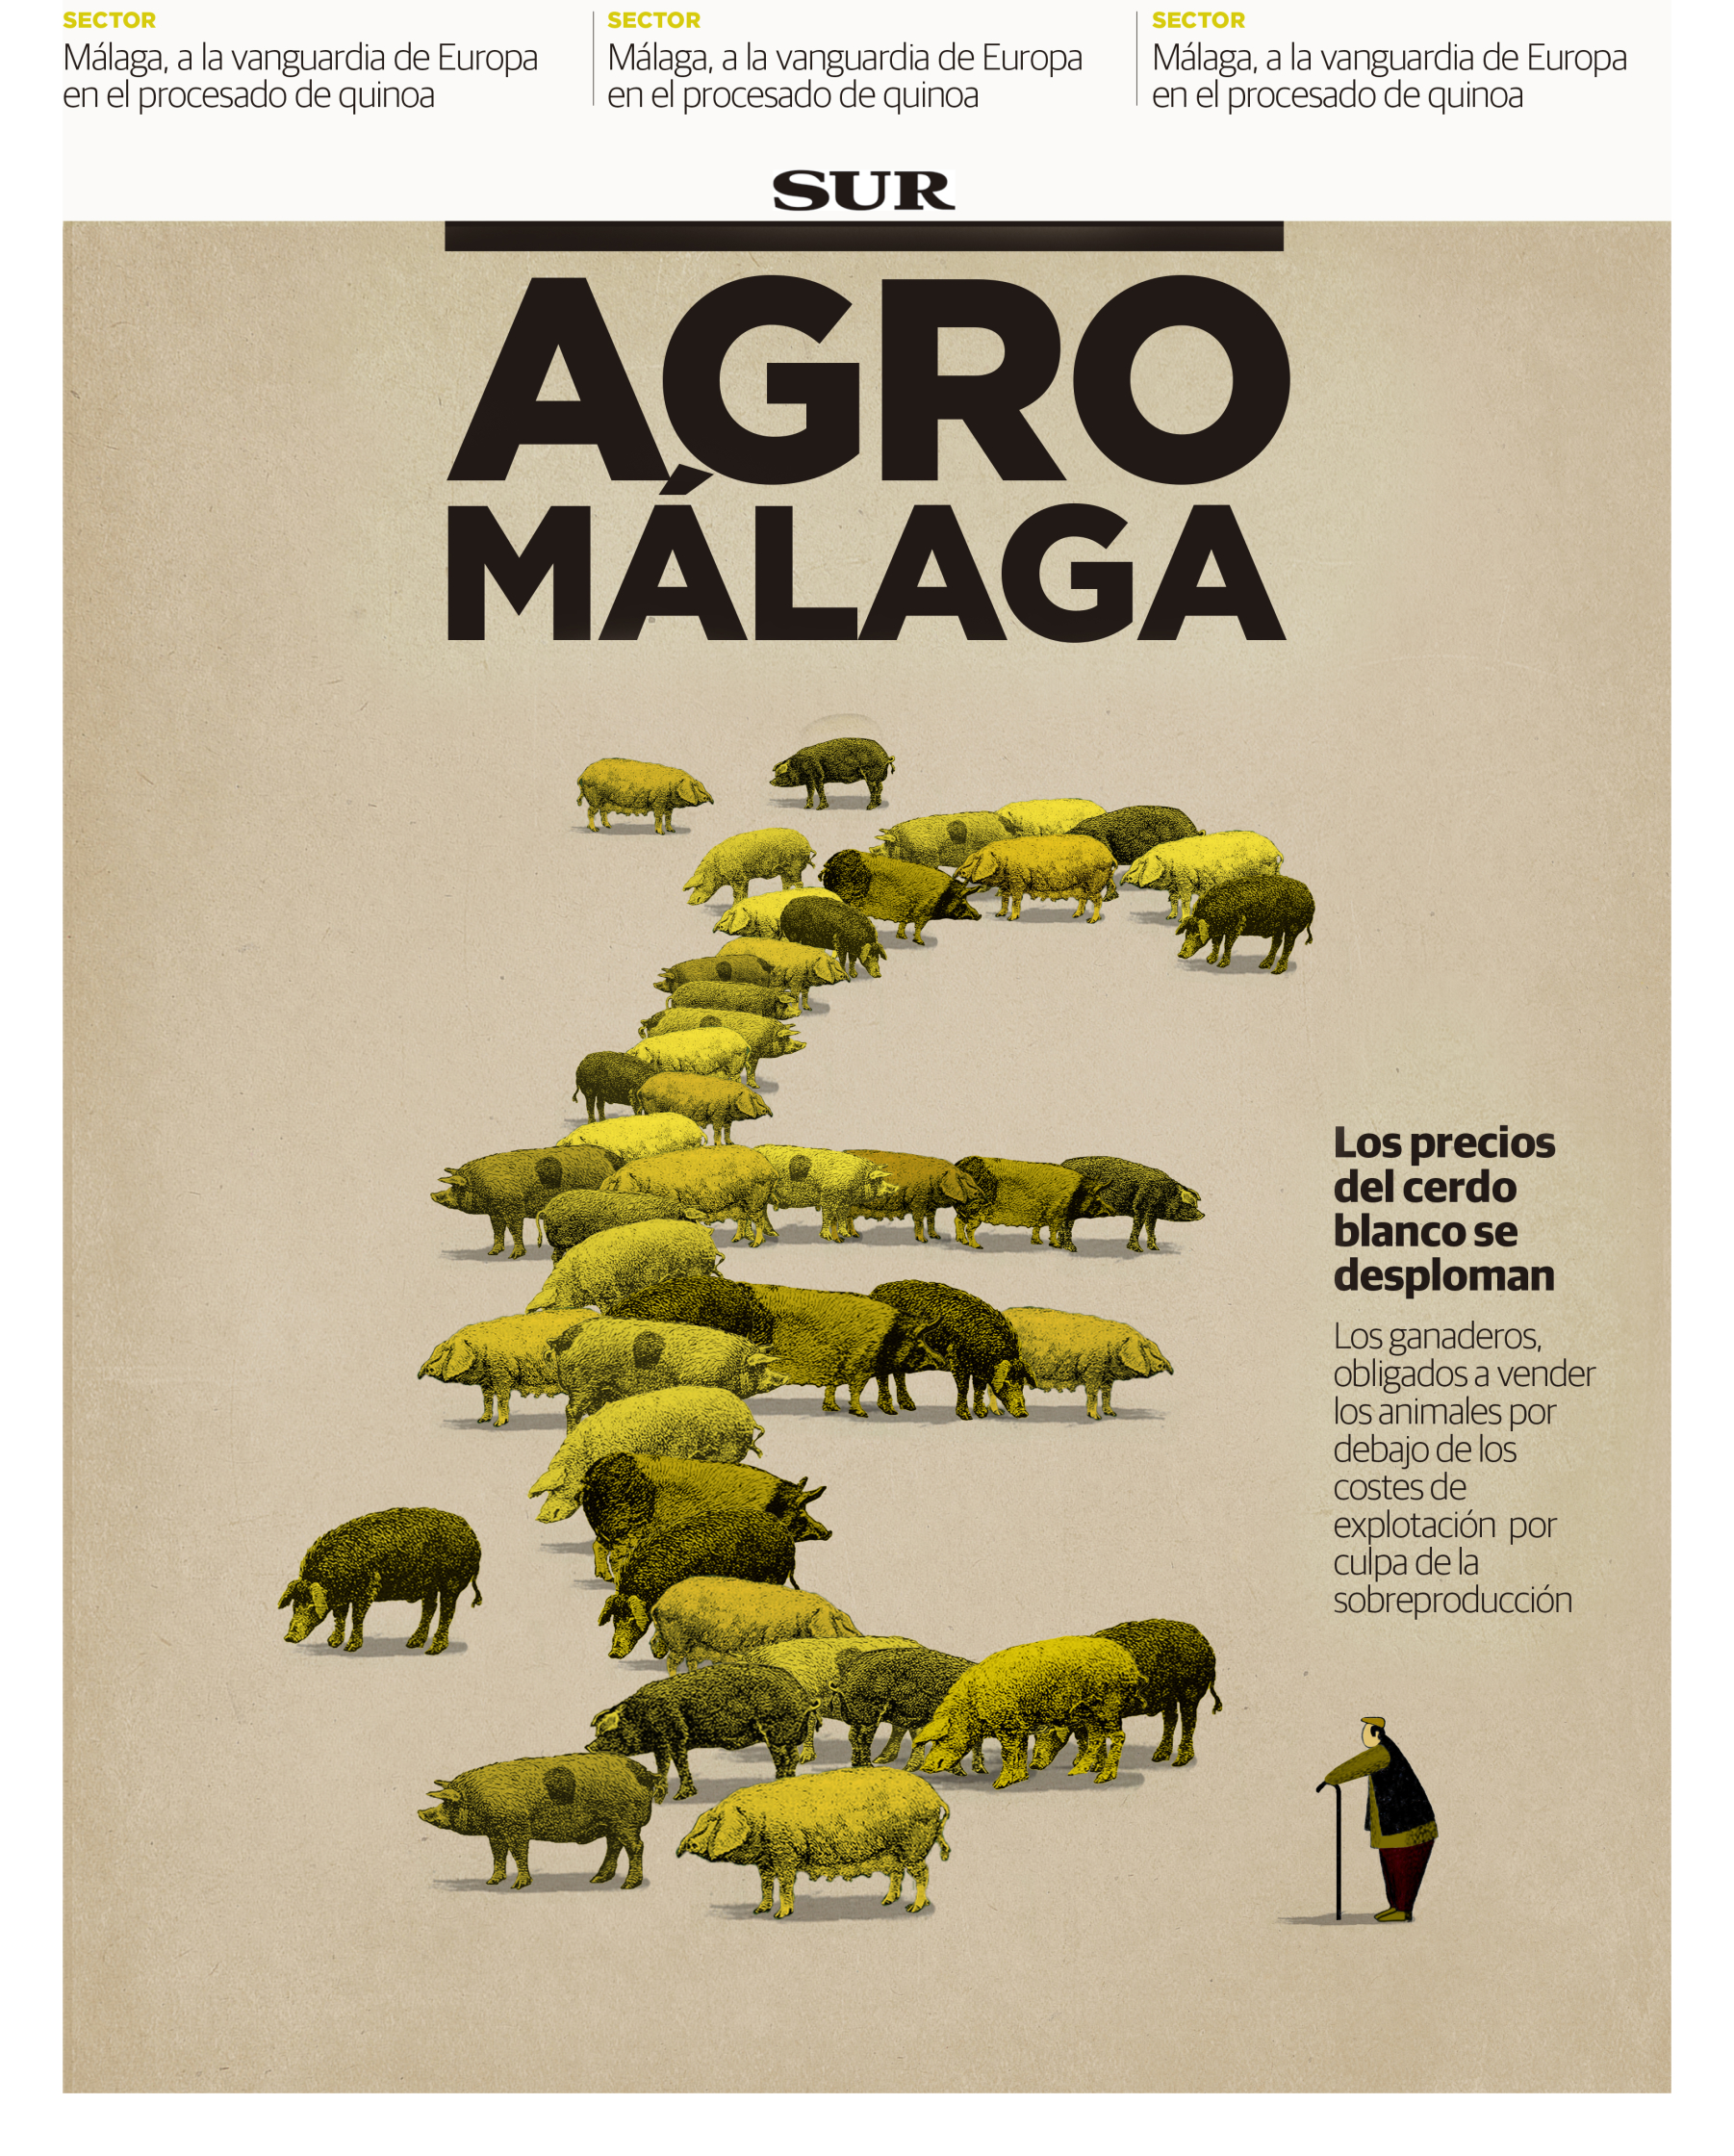 Diario Sur cover.jpg